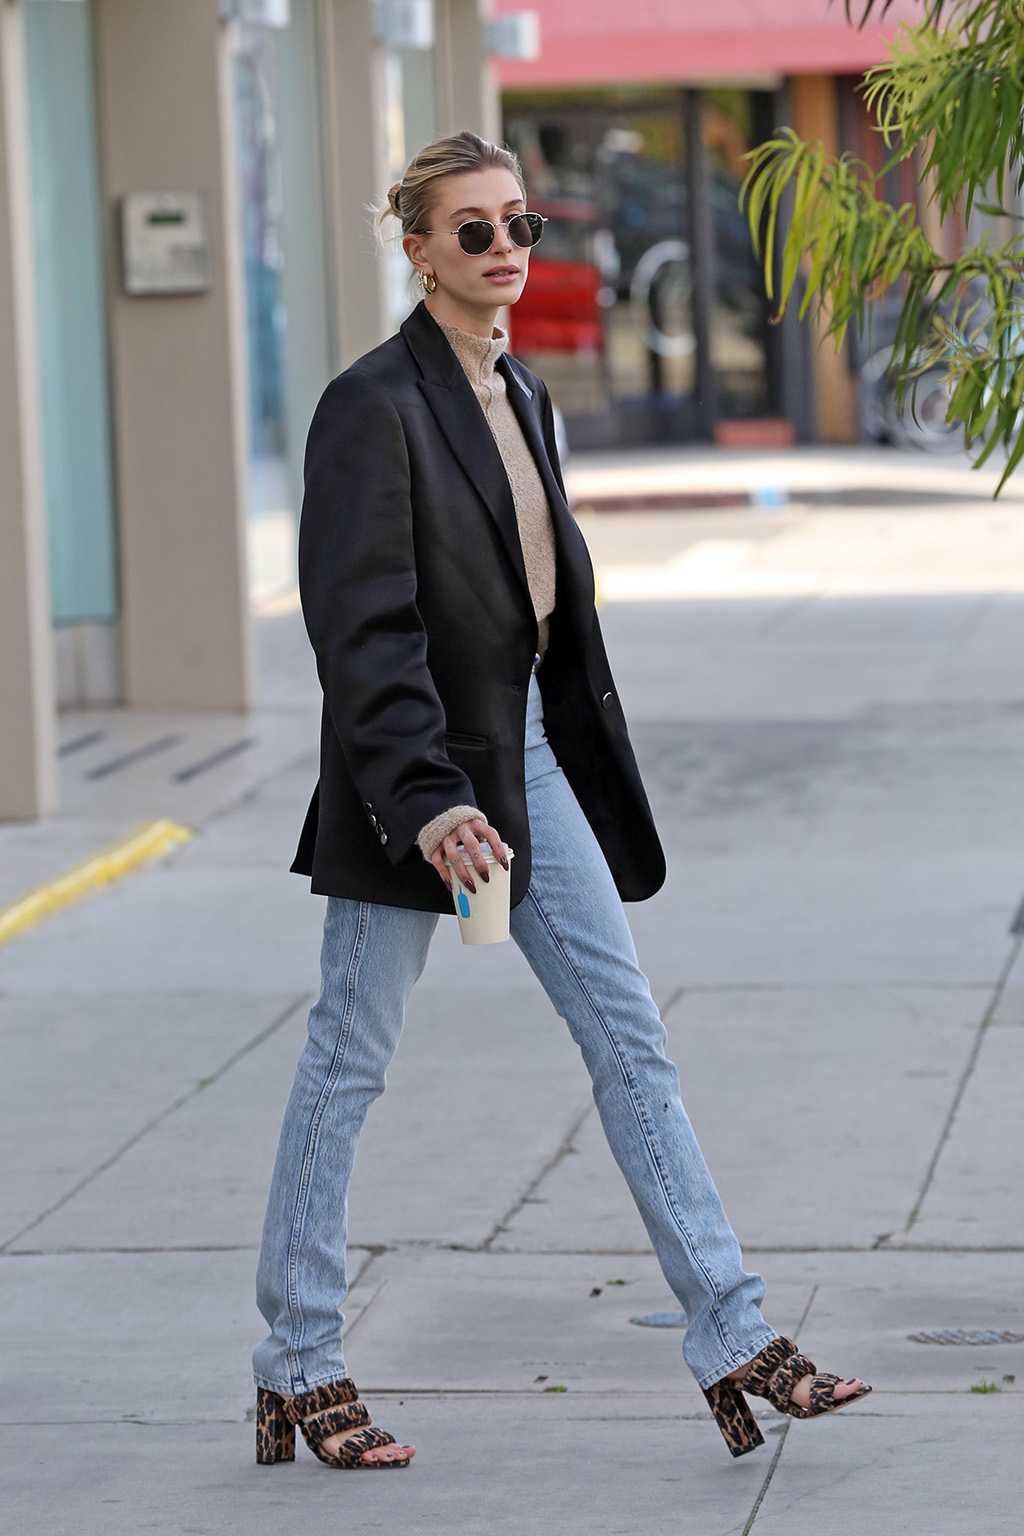 hailey baldwin, krewe sunglasses, jil sander shirt, off-white blazer, khaite jeans, chloe gosselin shoes, leopard print sandals, jennifer fisher hoops, blond hair, Hailey Bieber looks sophisticated while grabbing a coffee. 17 Dec 2019 Pictured: Hailey Bieber. Photo credit: Rachpoot/MEGA TheMegaAgency.com +1 888 505 6342 (Mega Agency TagID: MEGA570760_004.jpg) [Photo via Mega Agency]